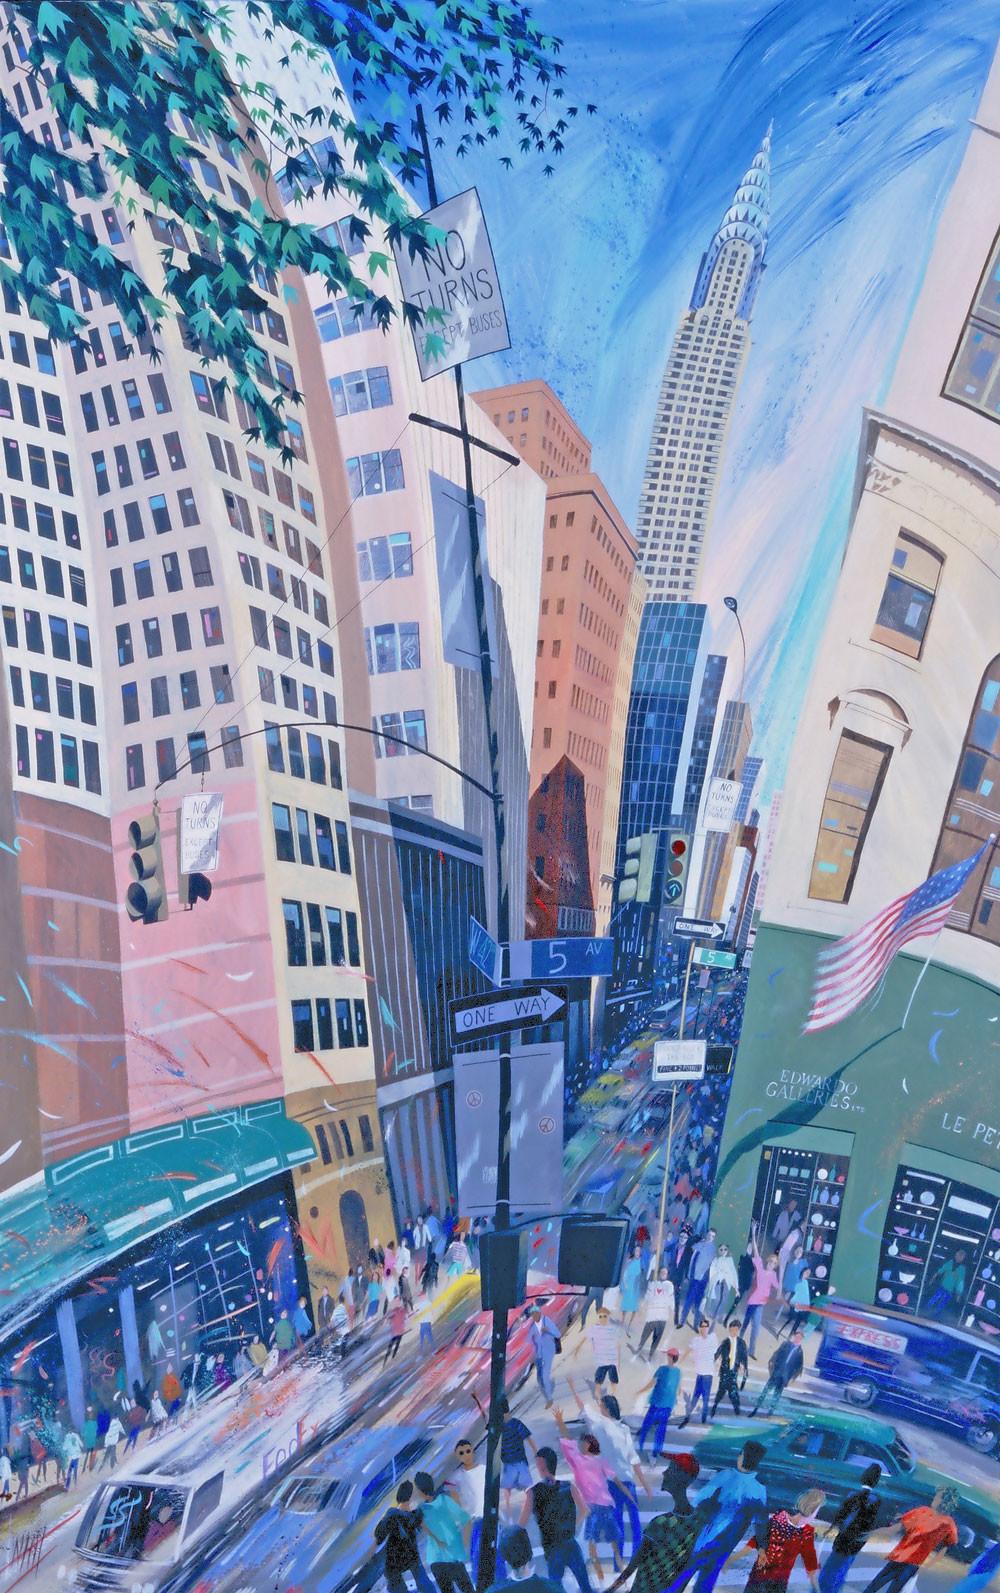 West 42nd Street, New York (1998)